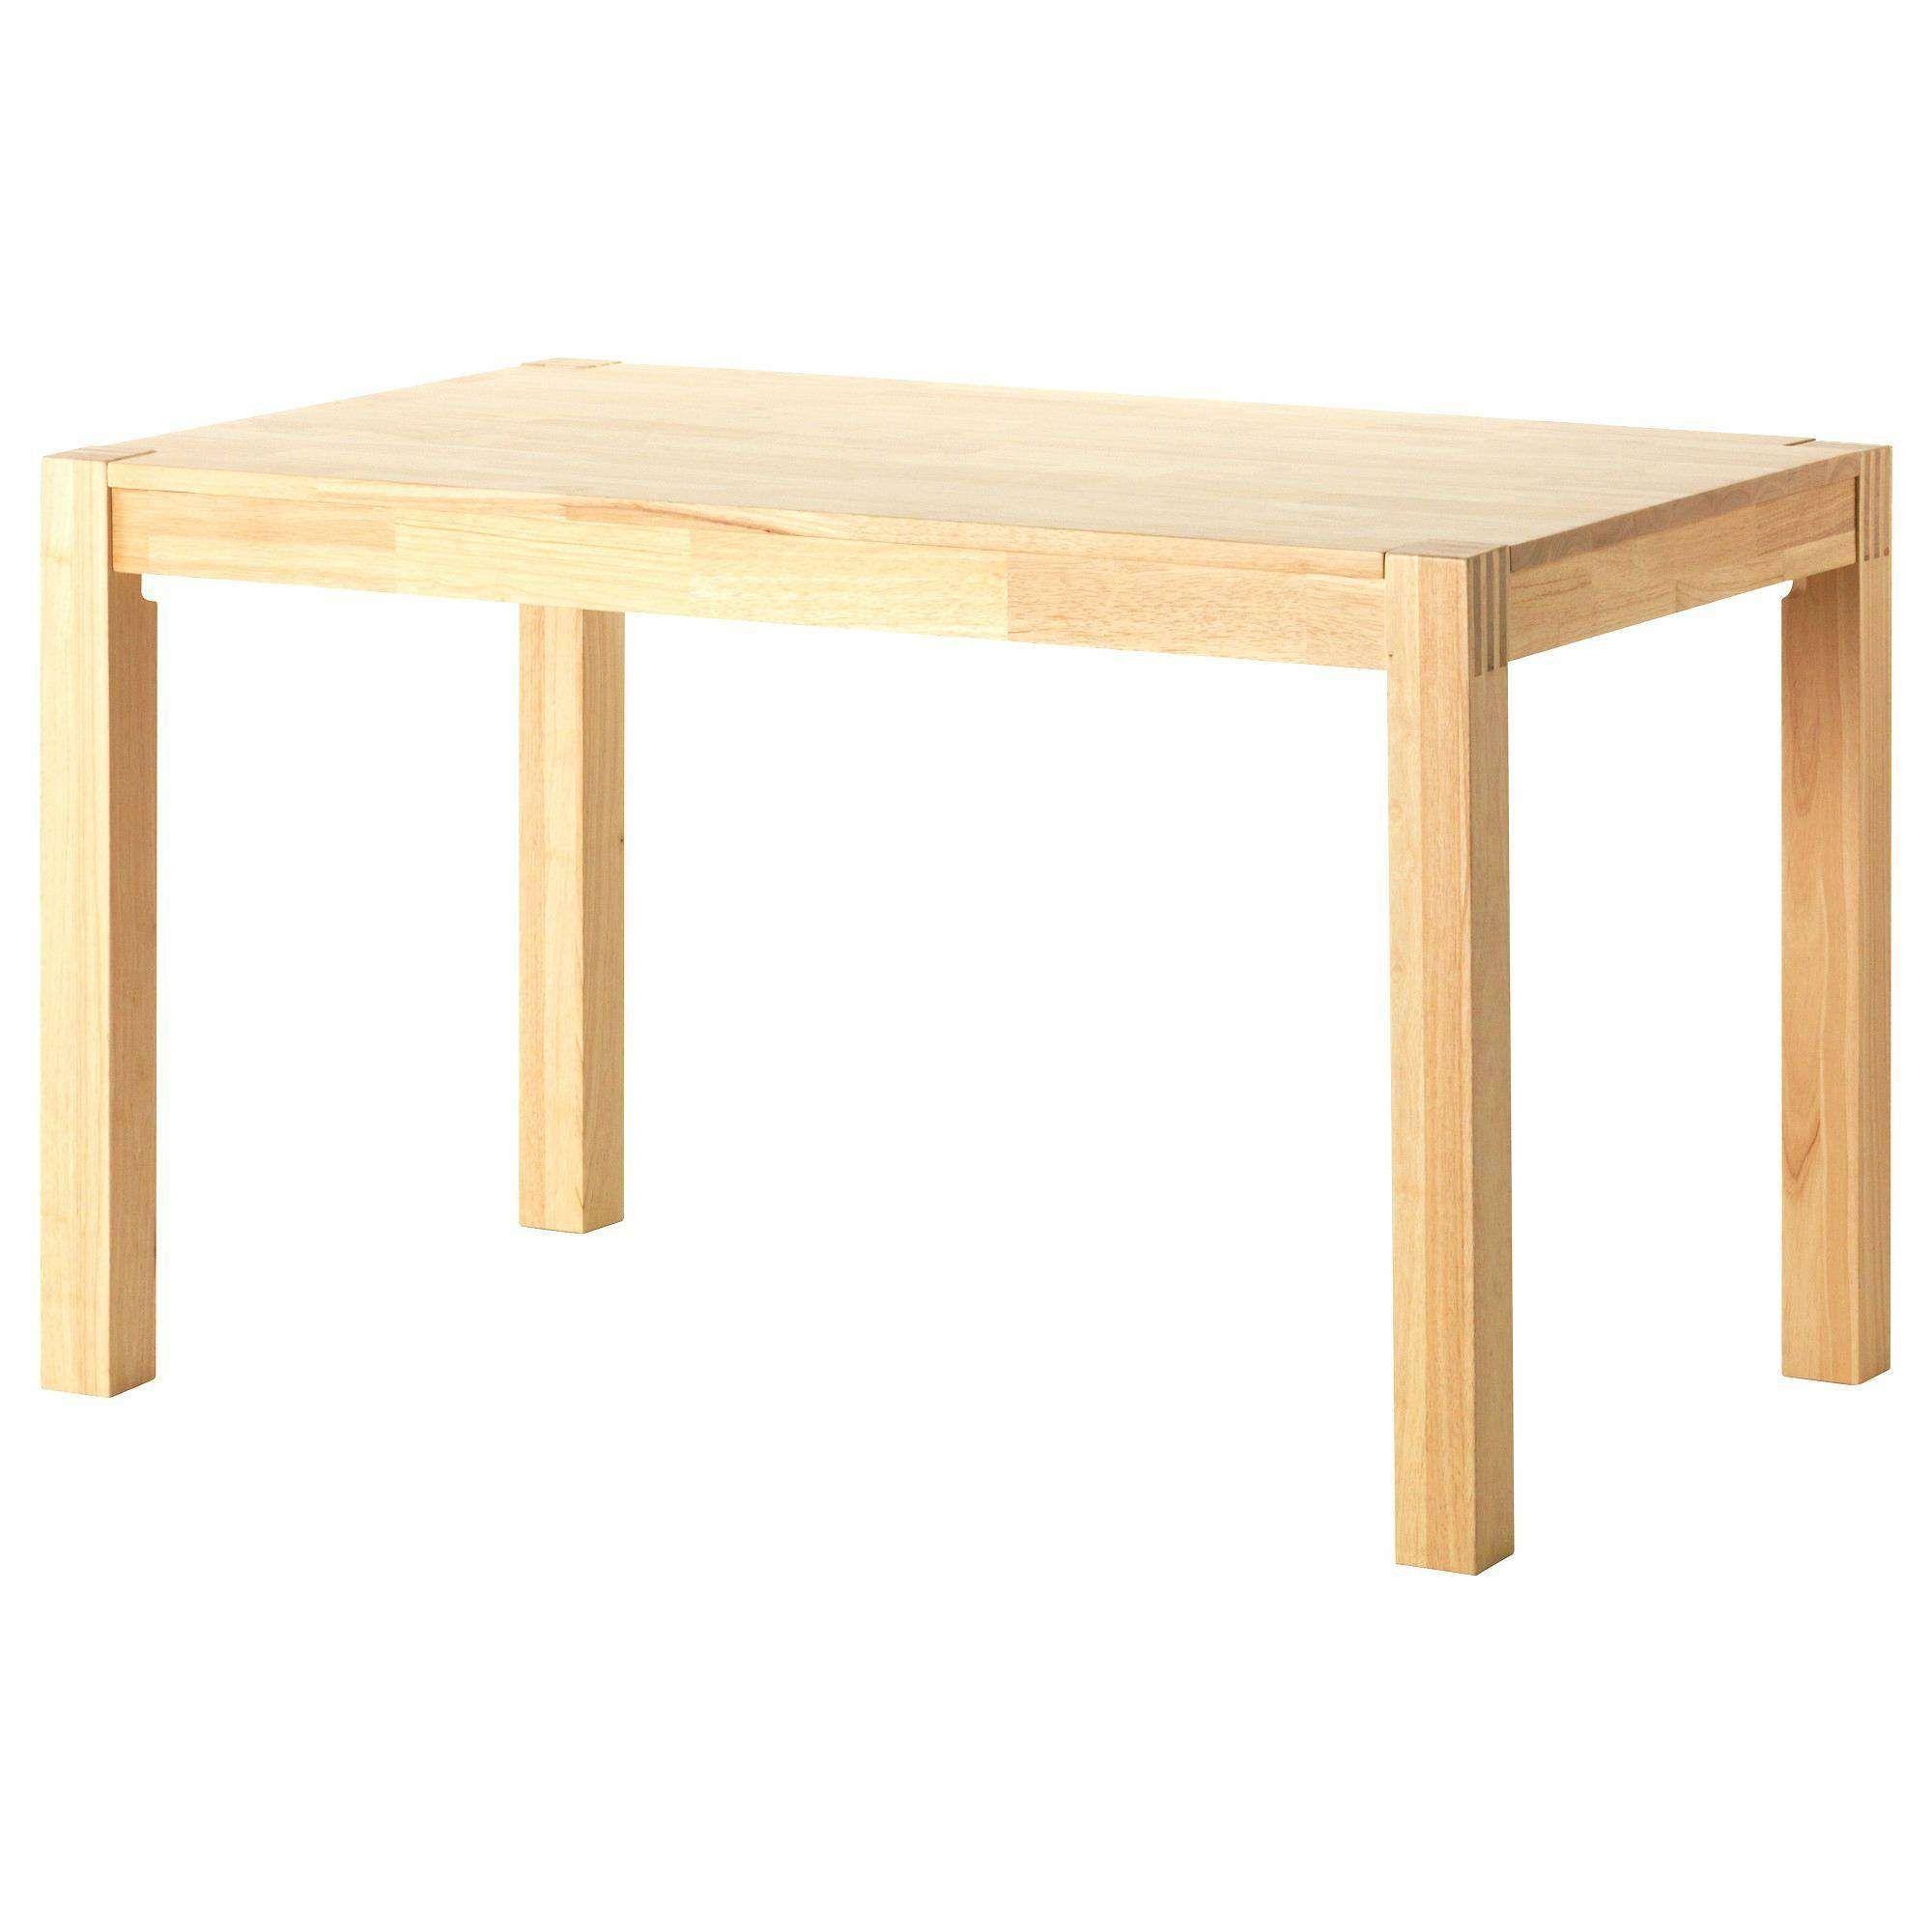 Esszimmertisch 120 X 80 Tisch 120 X 80 Einzigartig 25 Konzept Beste Mobelideen In 2020 Ikea Dining Table Furniture